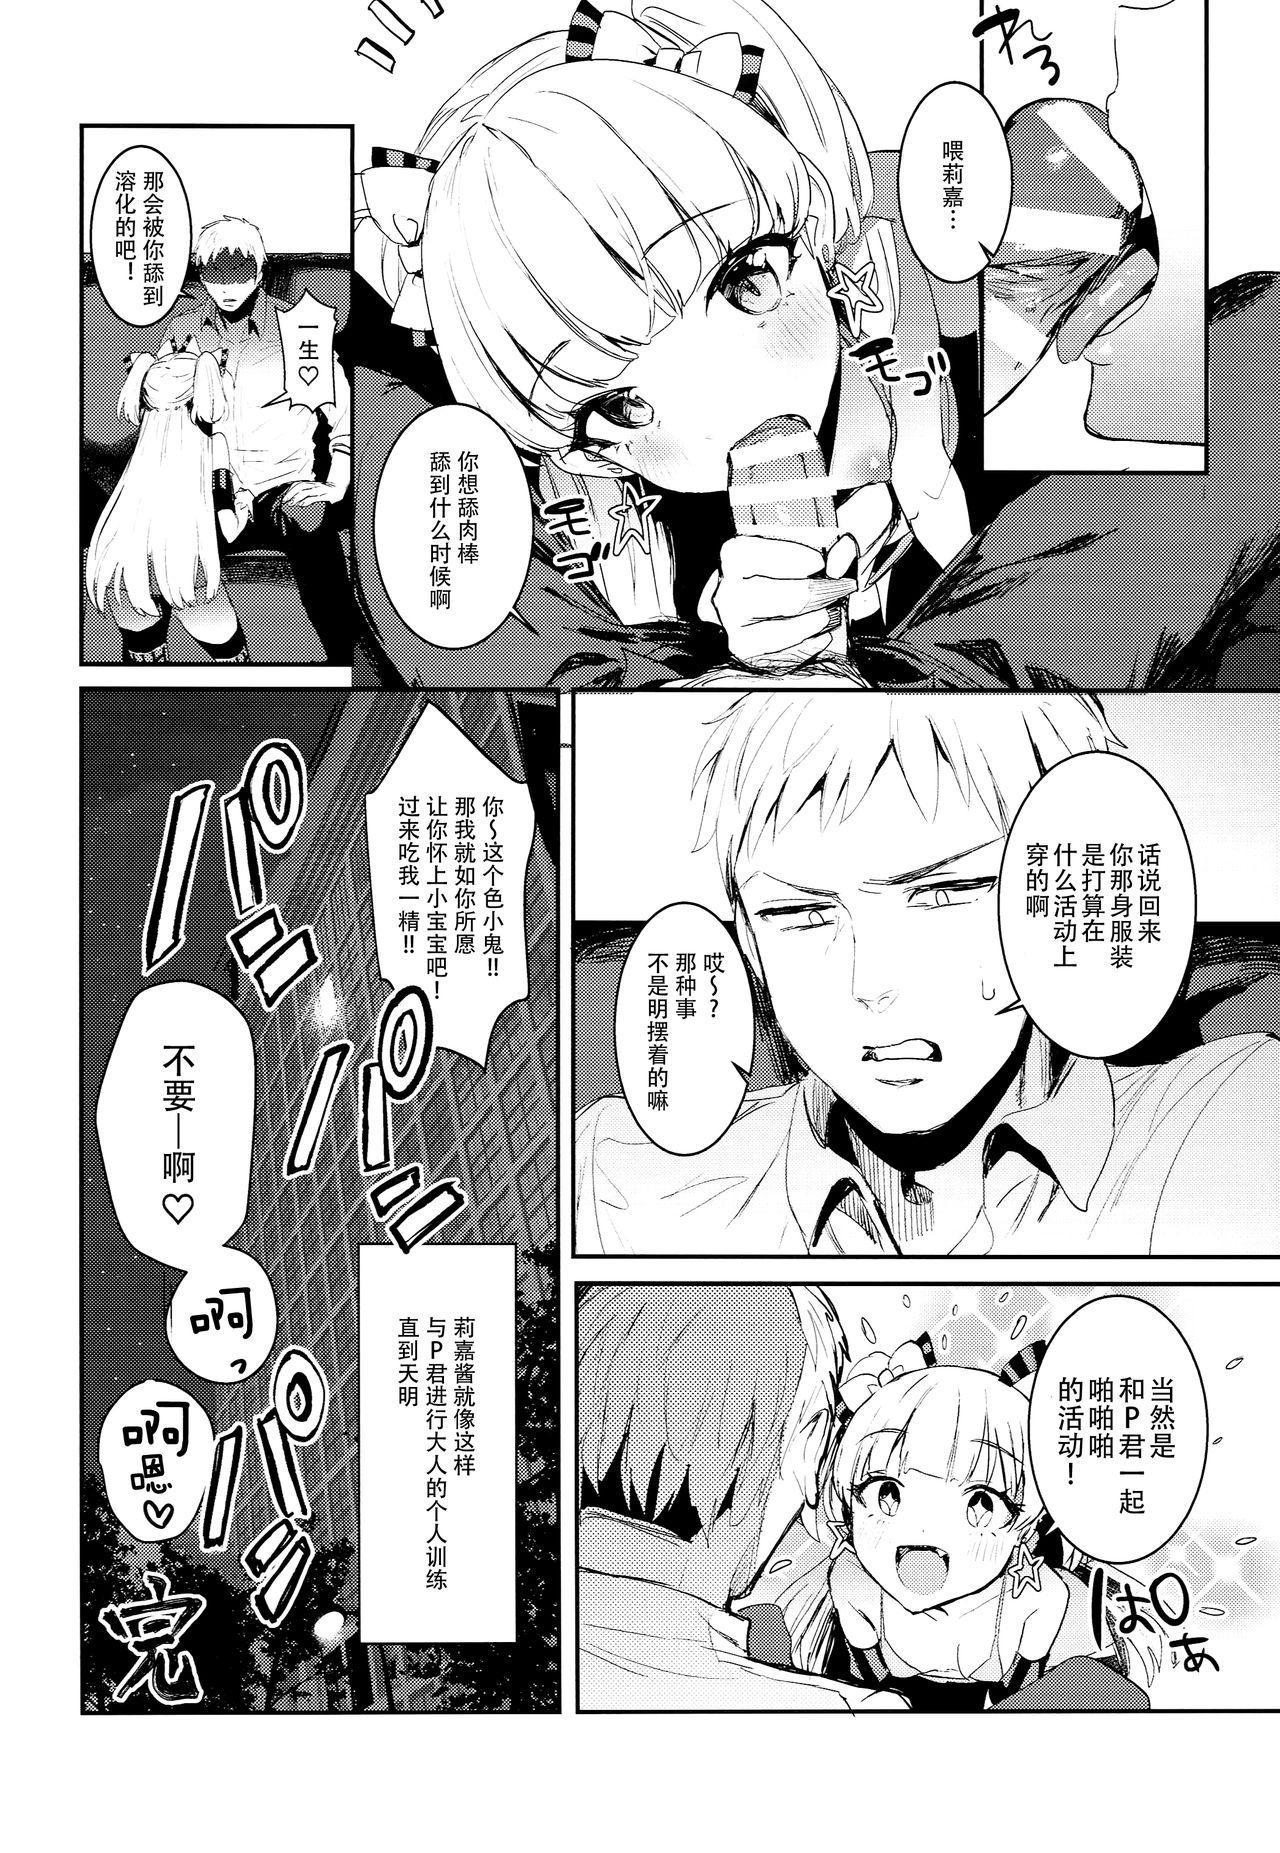 Rika-chan to Sealx 15